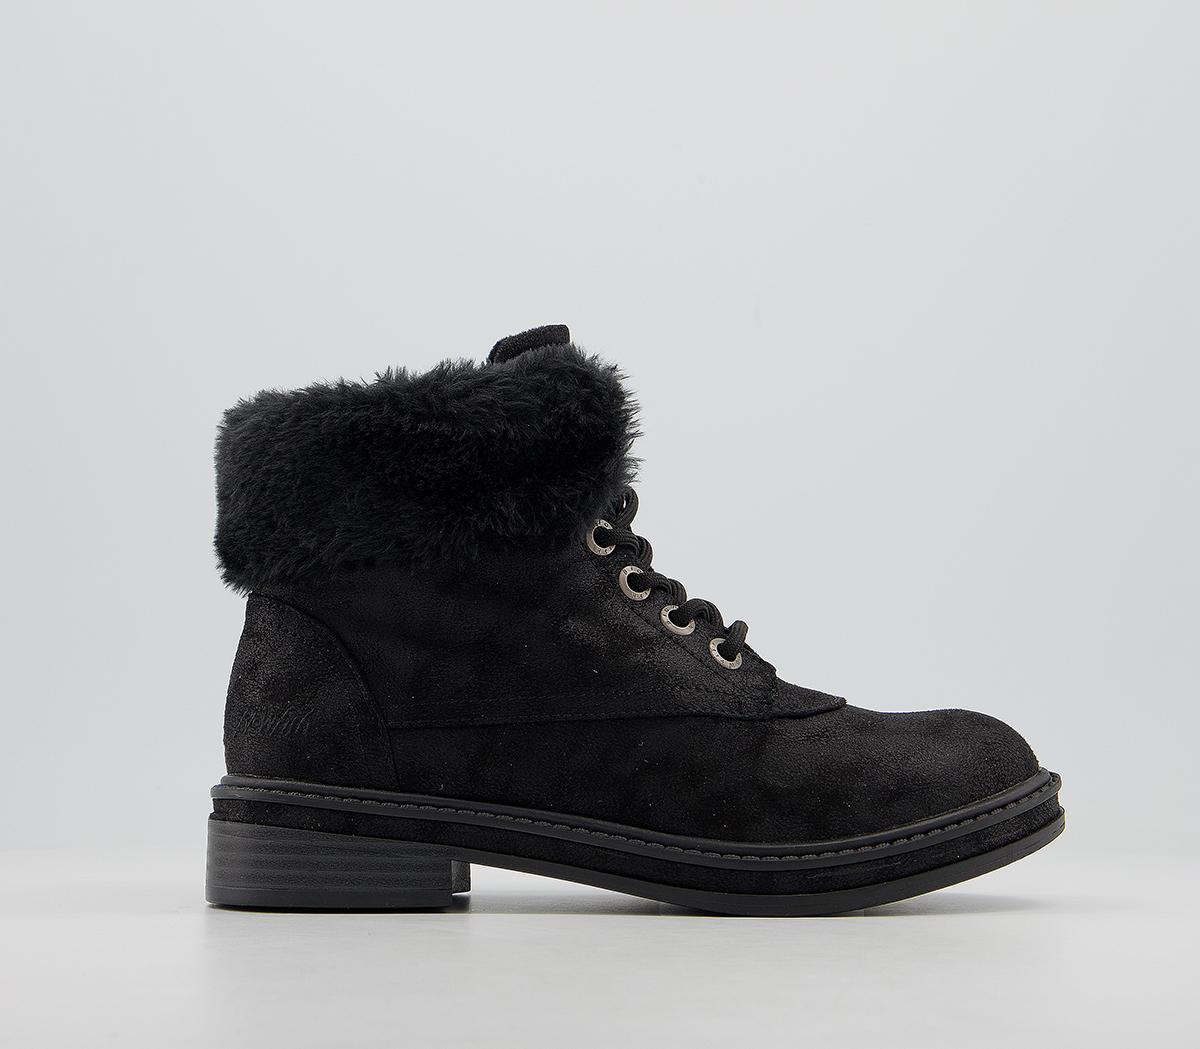 Kone4earth Lace Boots